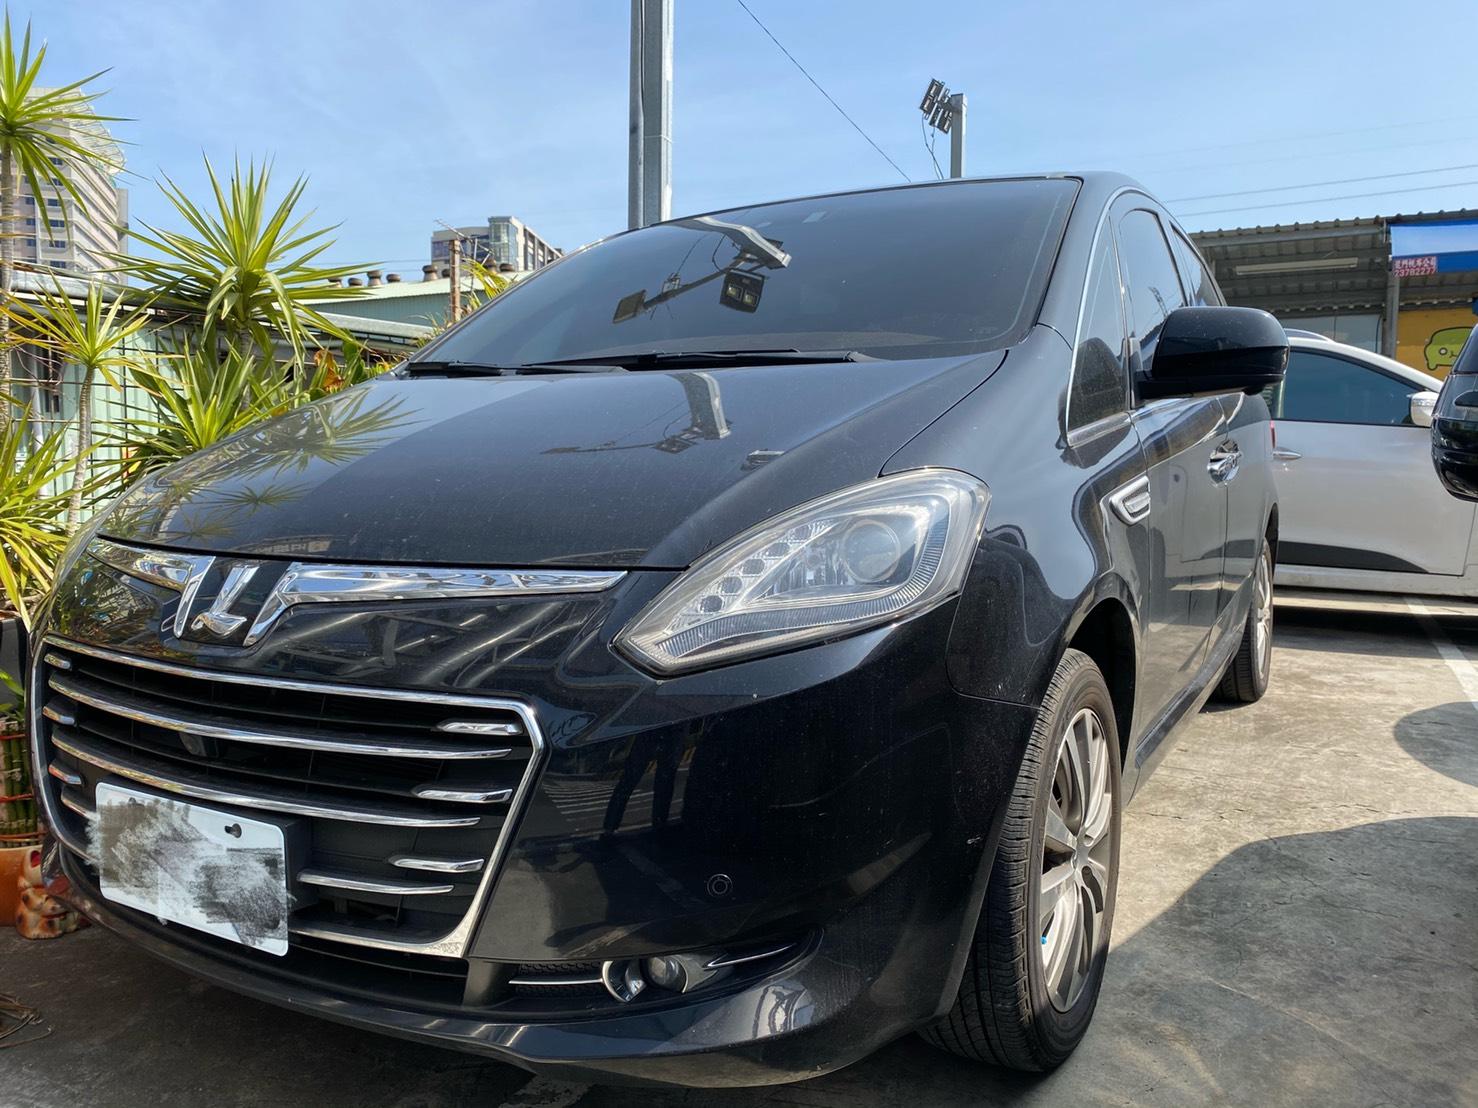 2014 Luxgen 納智捷 7 MPV